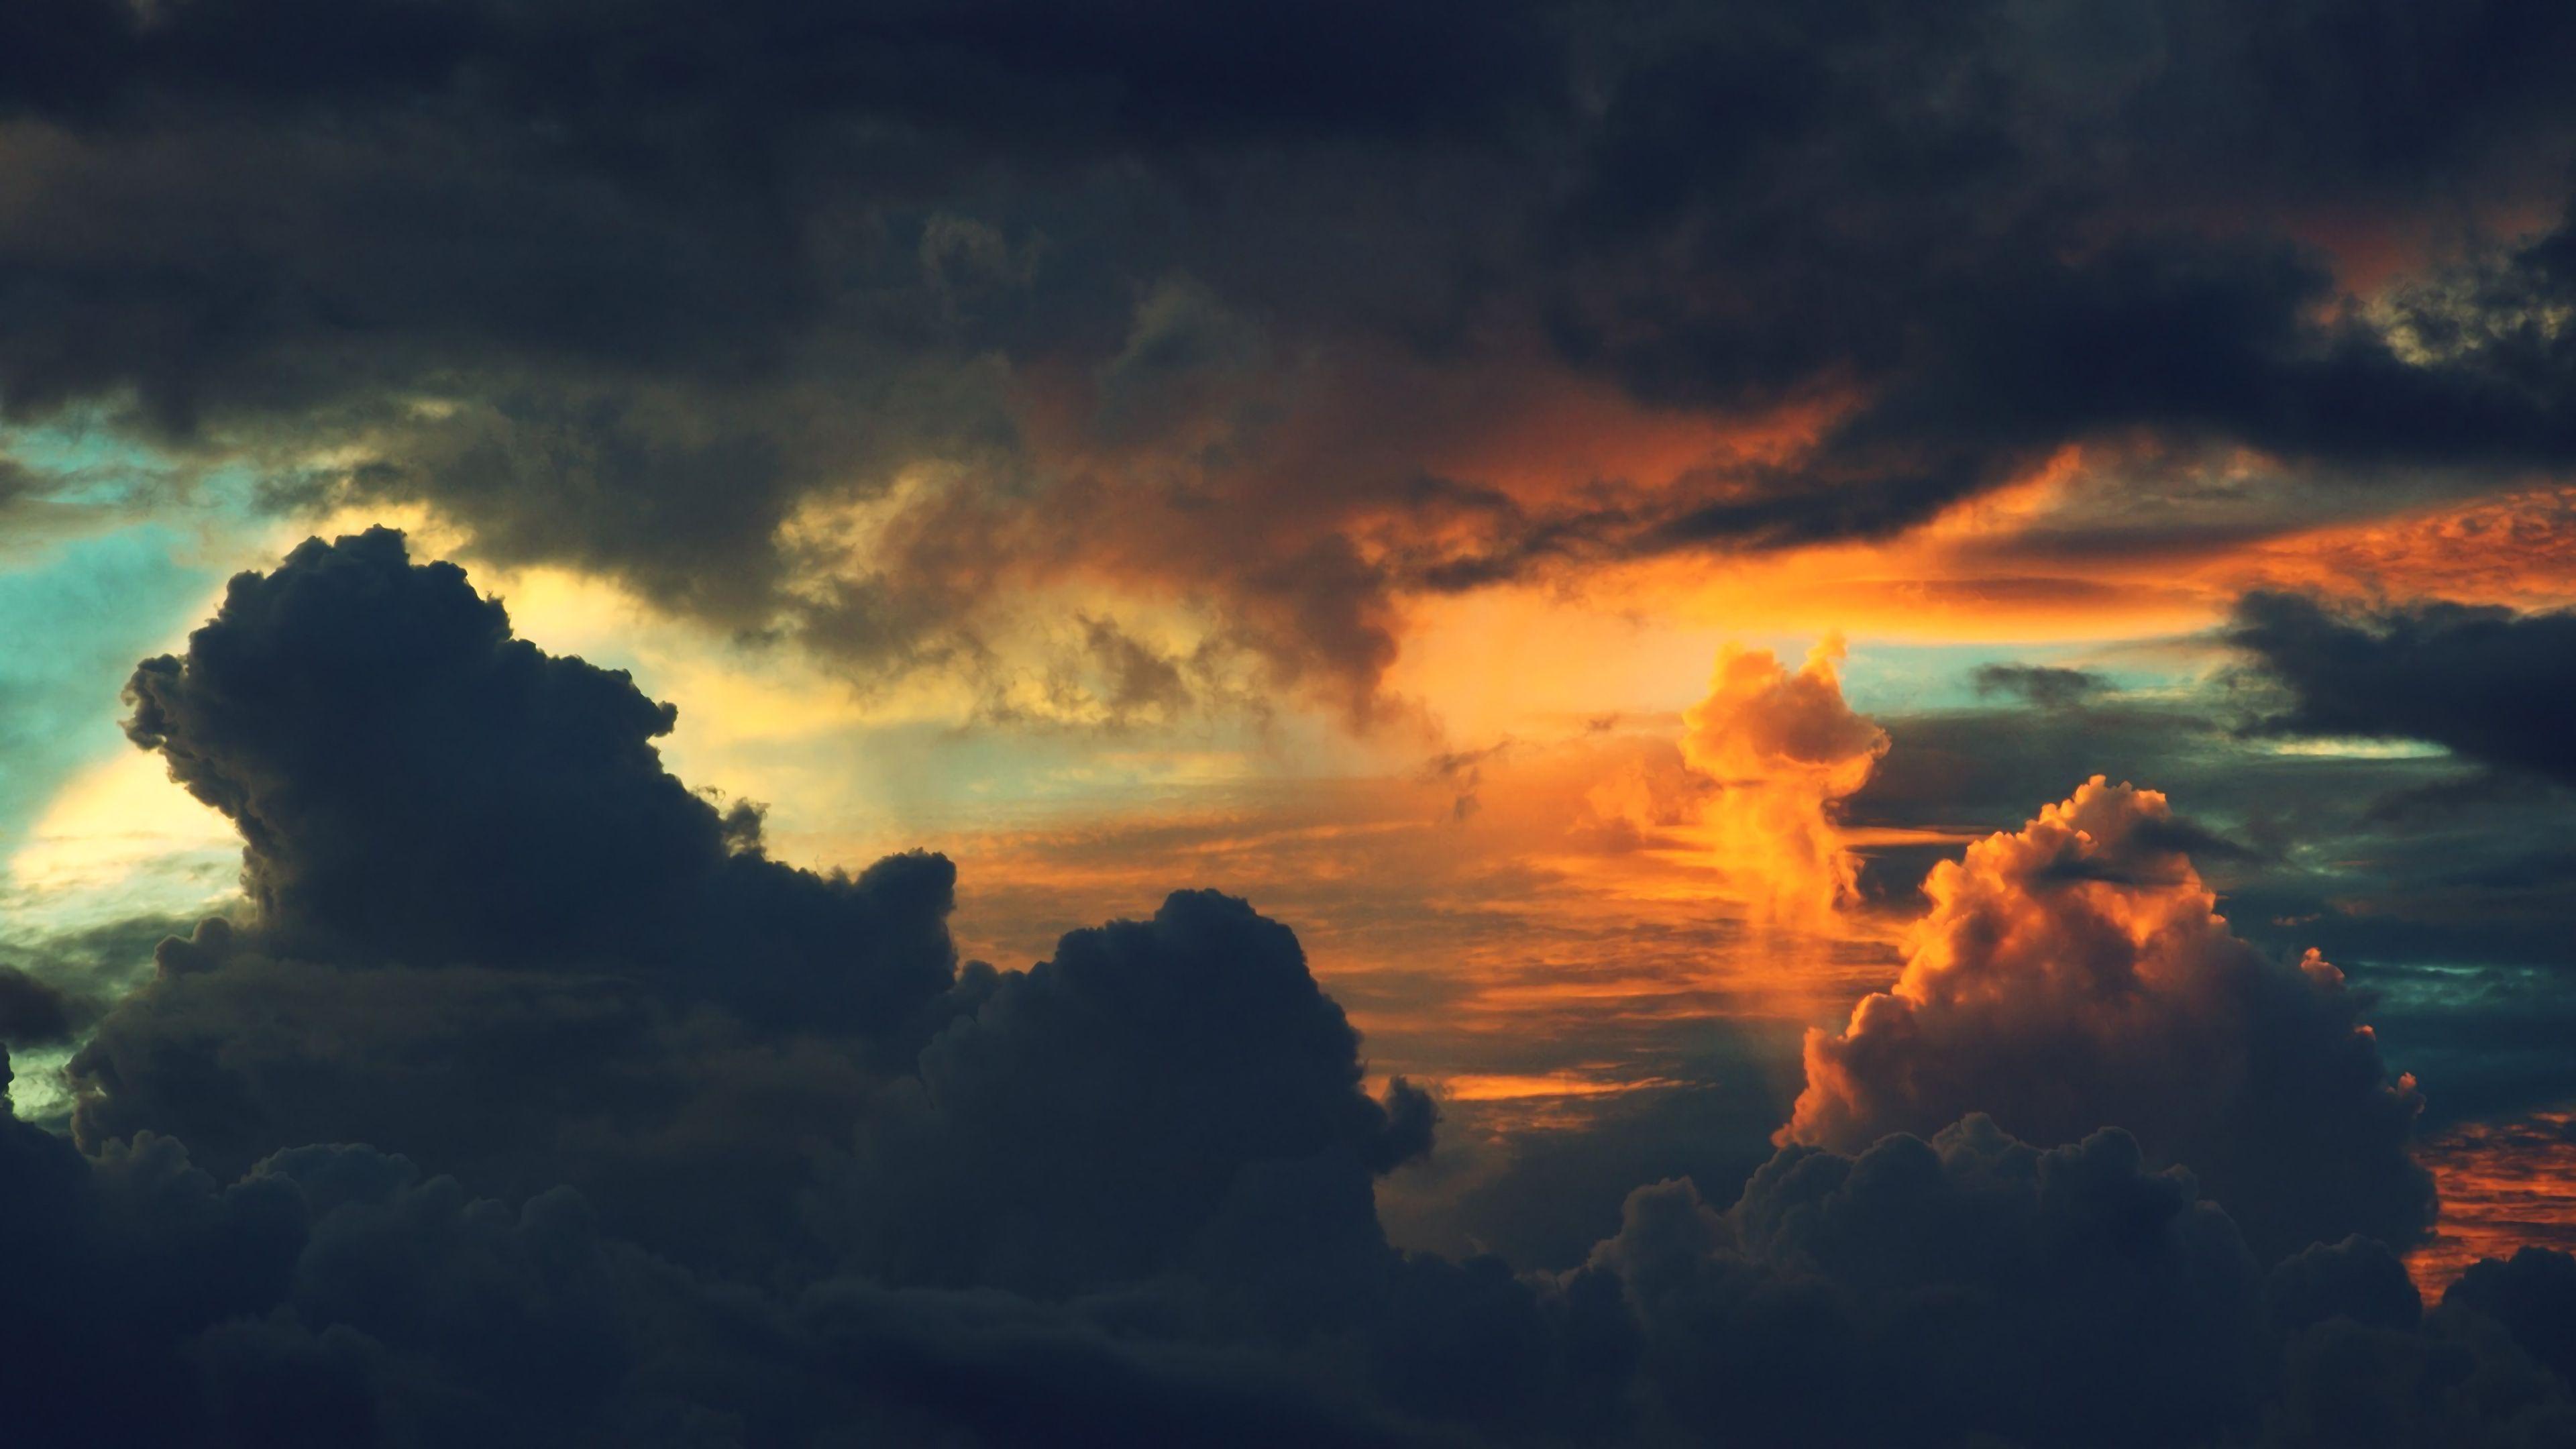 Wallpaper 4k Sky Clouds 4k 4kwallpapers, clouds